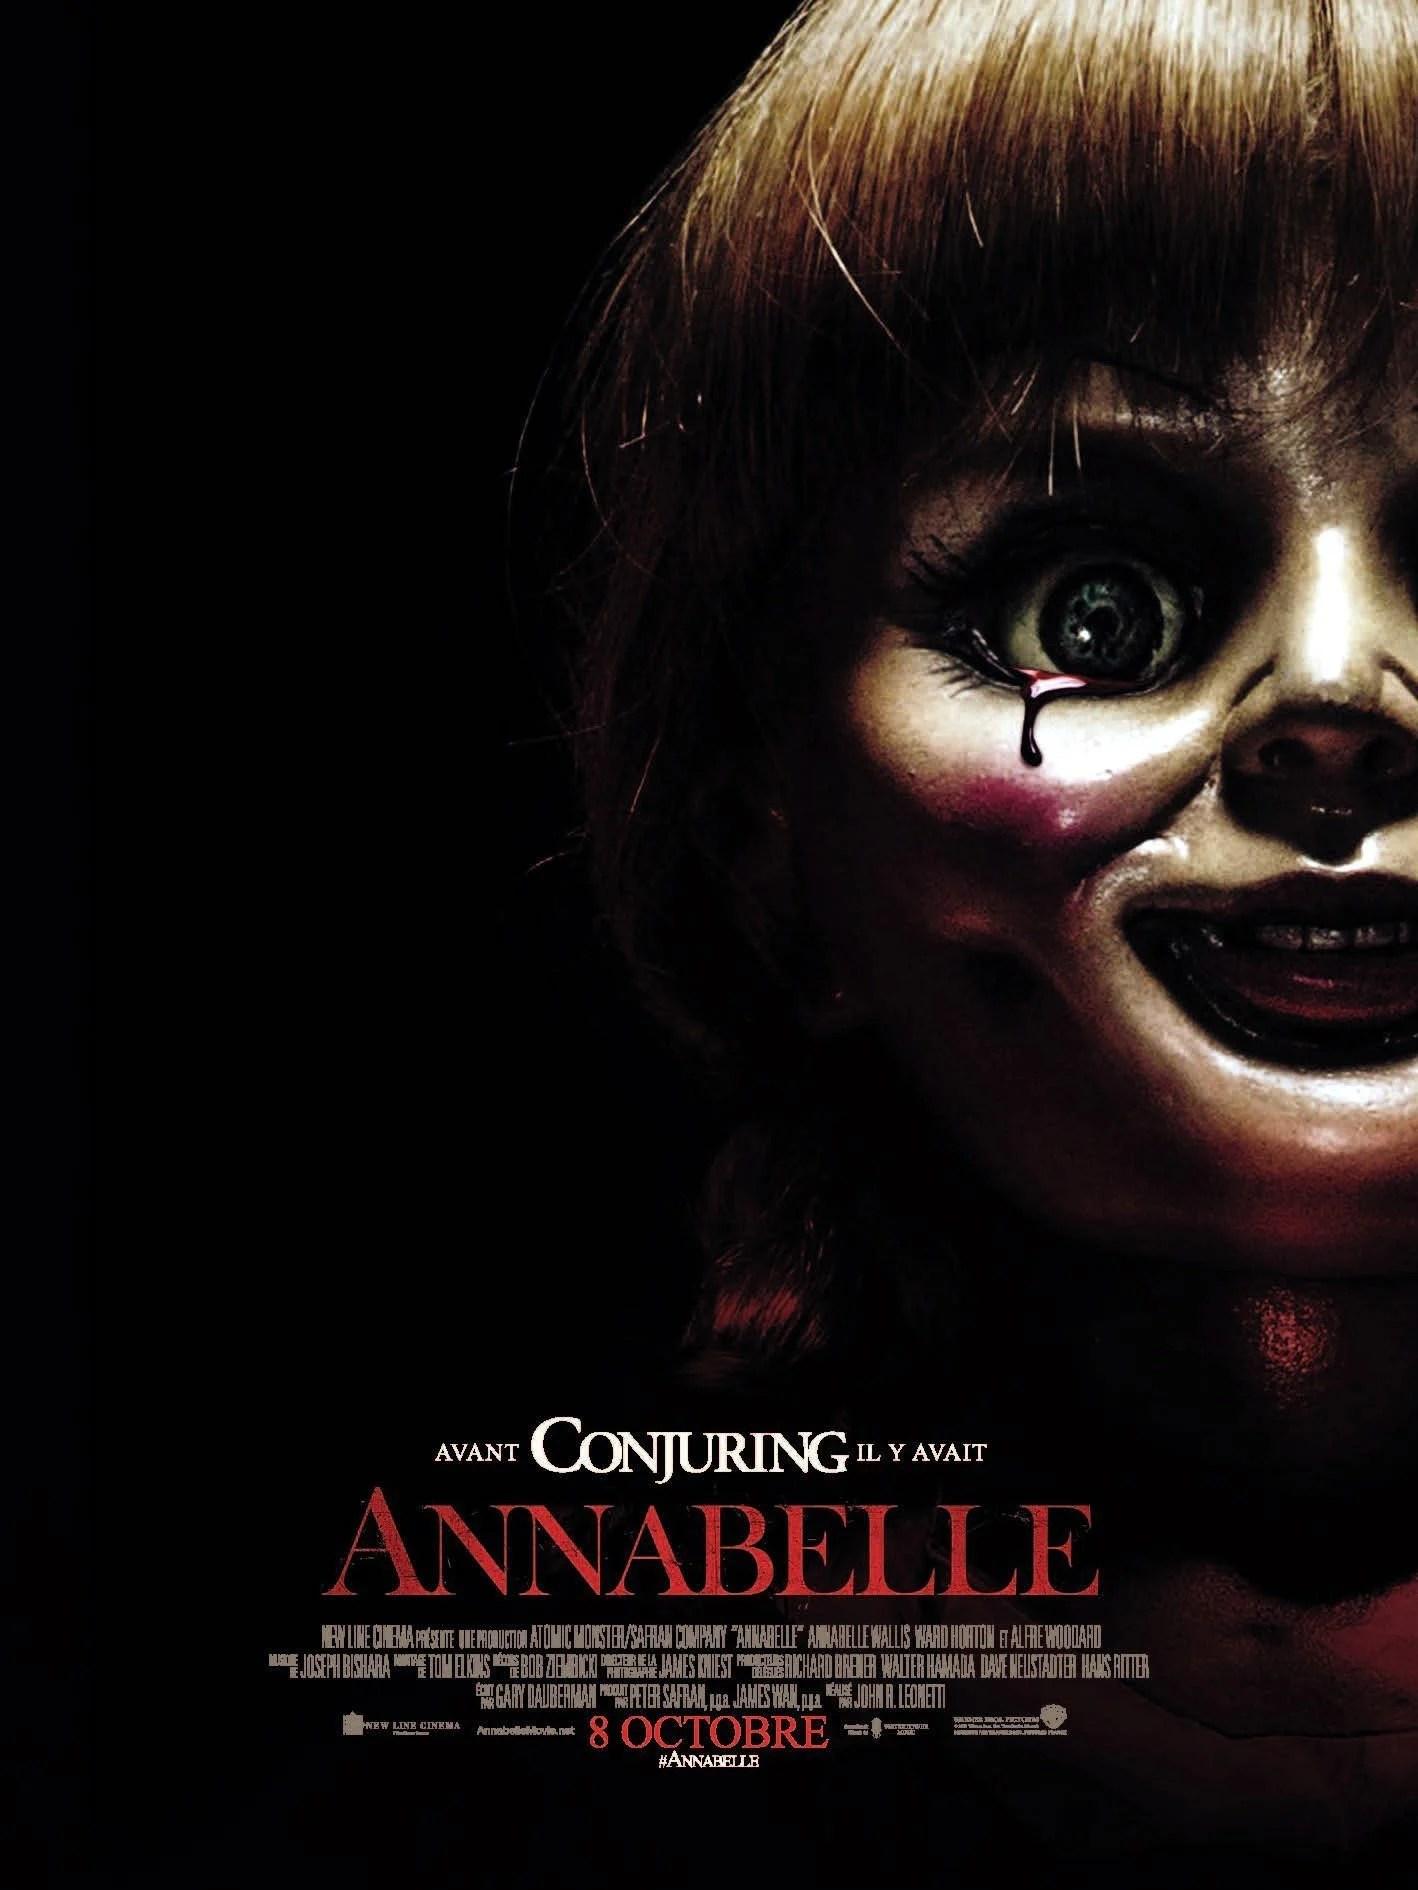 Annabelle 1 En Francais Complet : annabelle, francais, complet, Annabelle, (Film,, 2014), CinéSéries